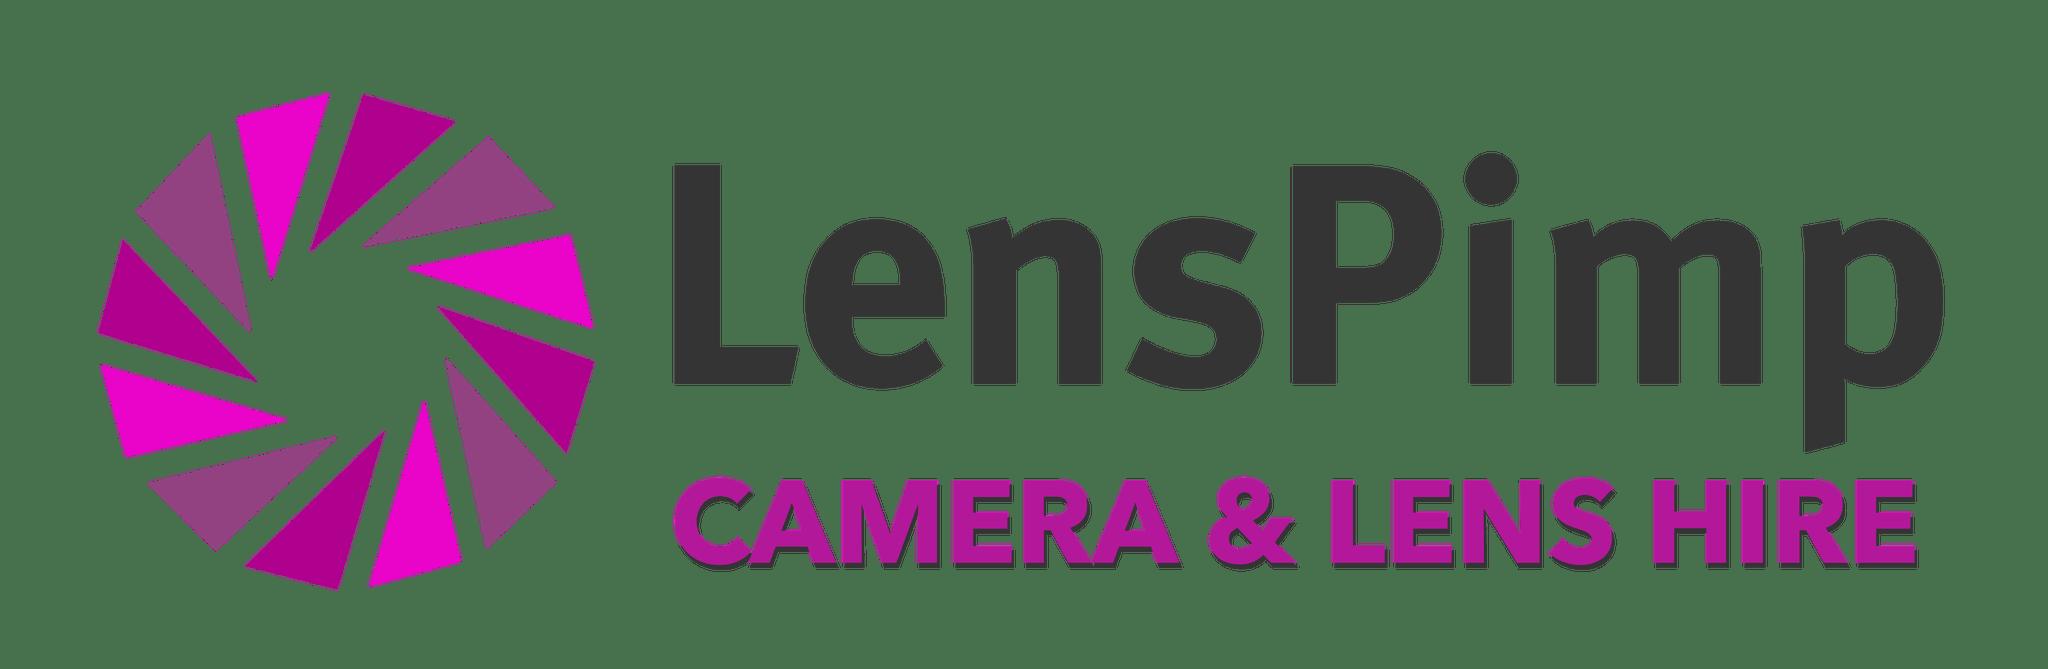 LensPimp